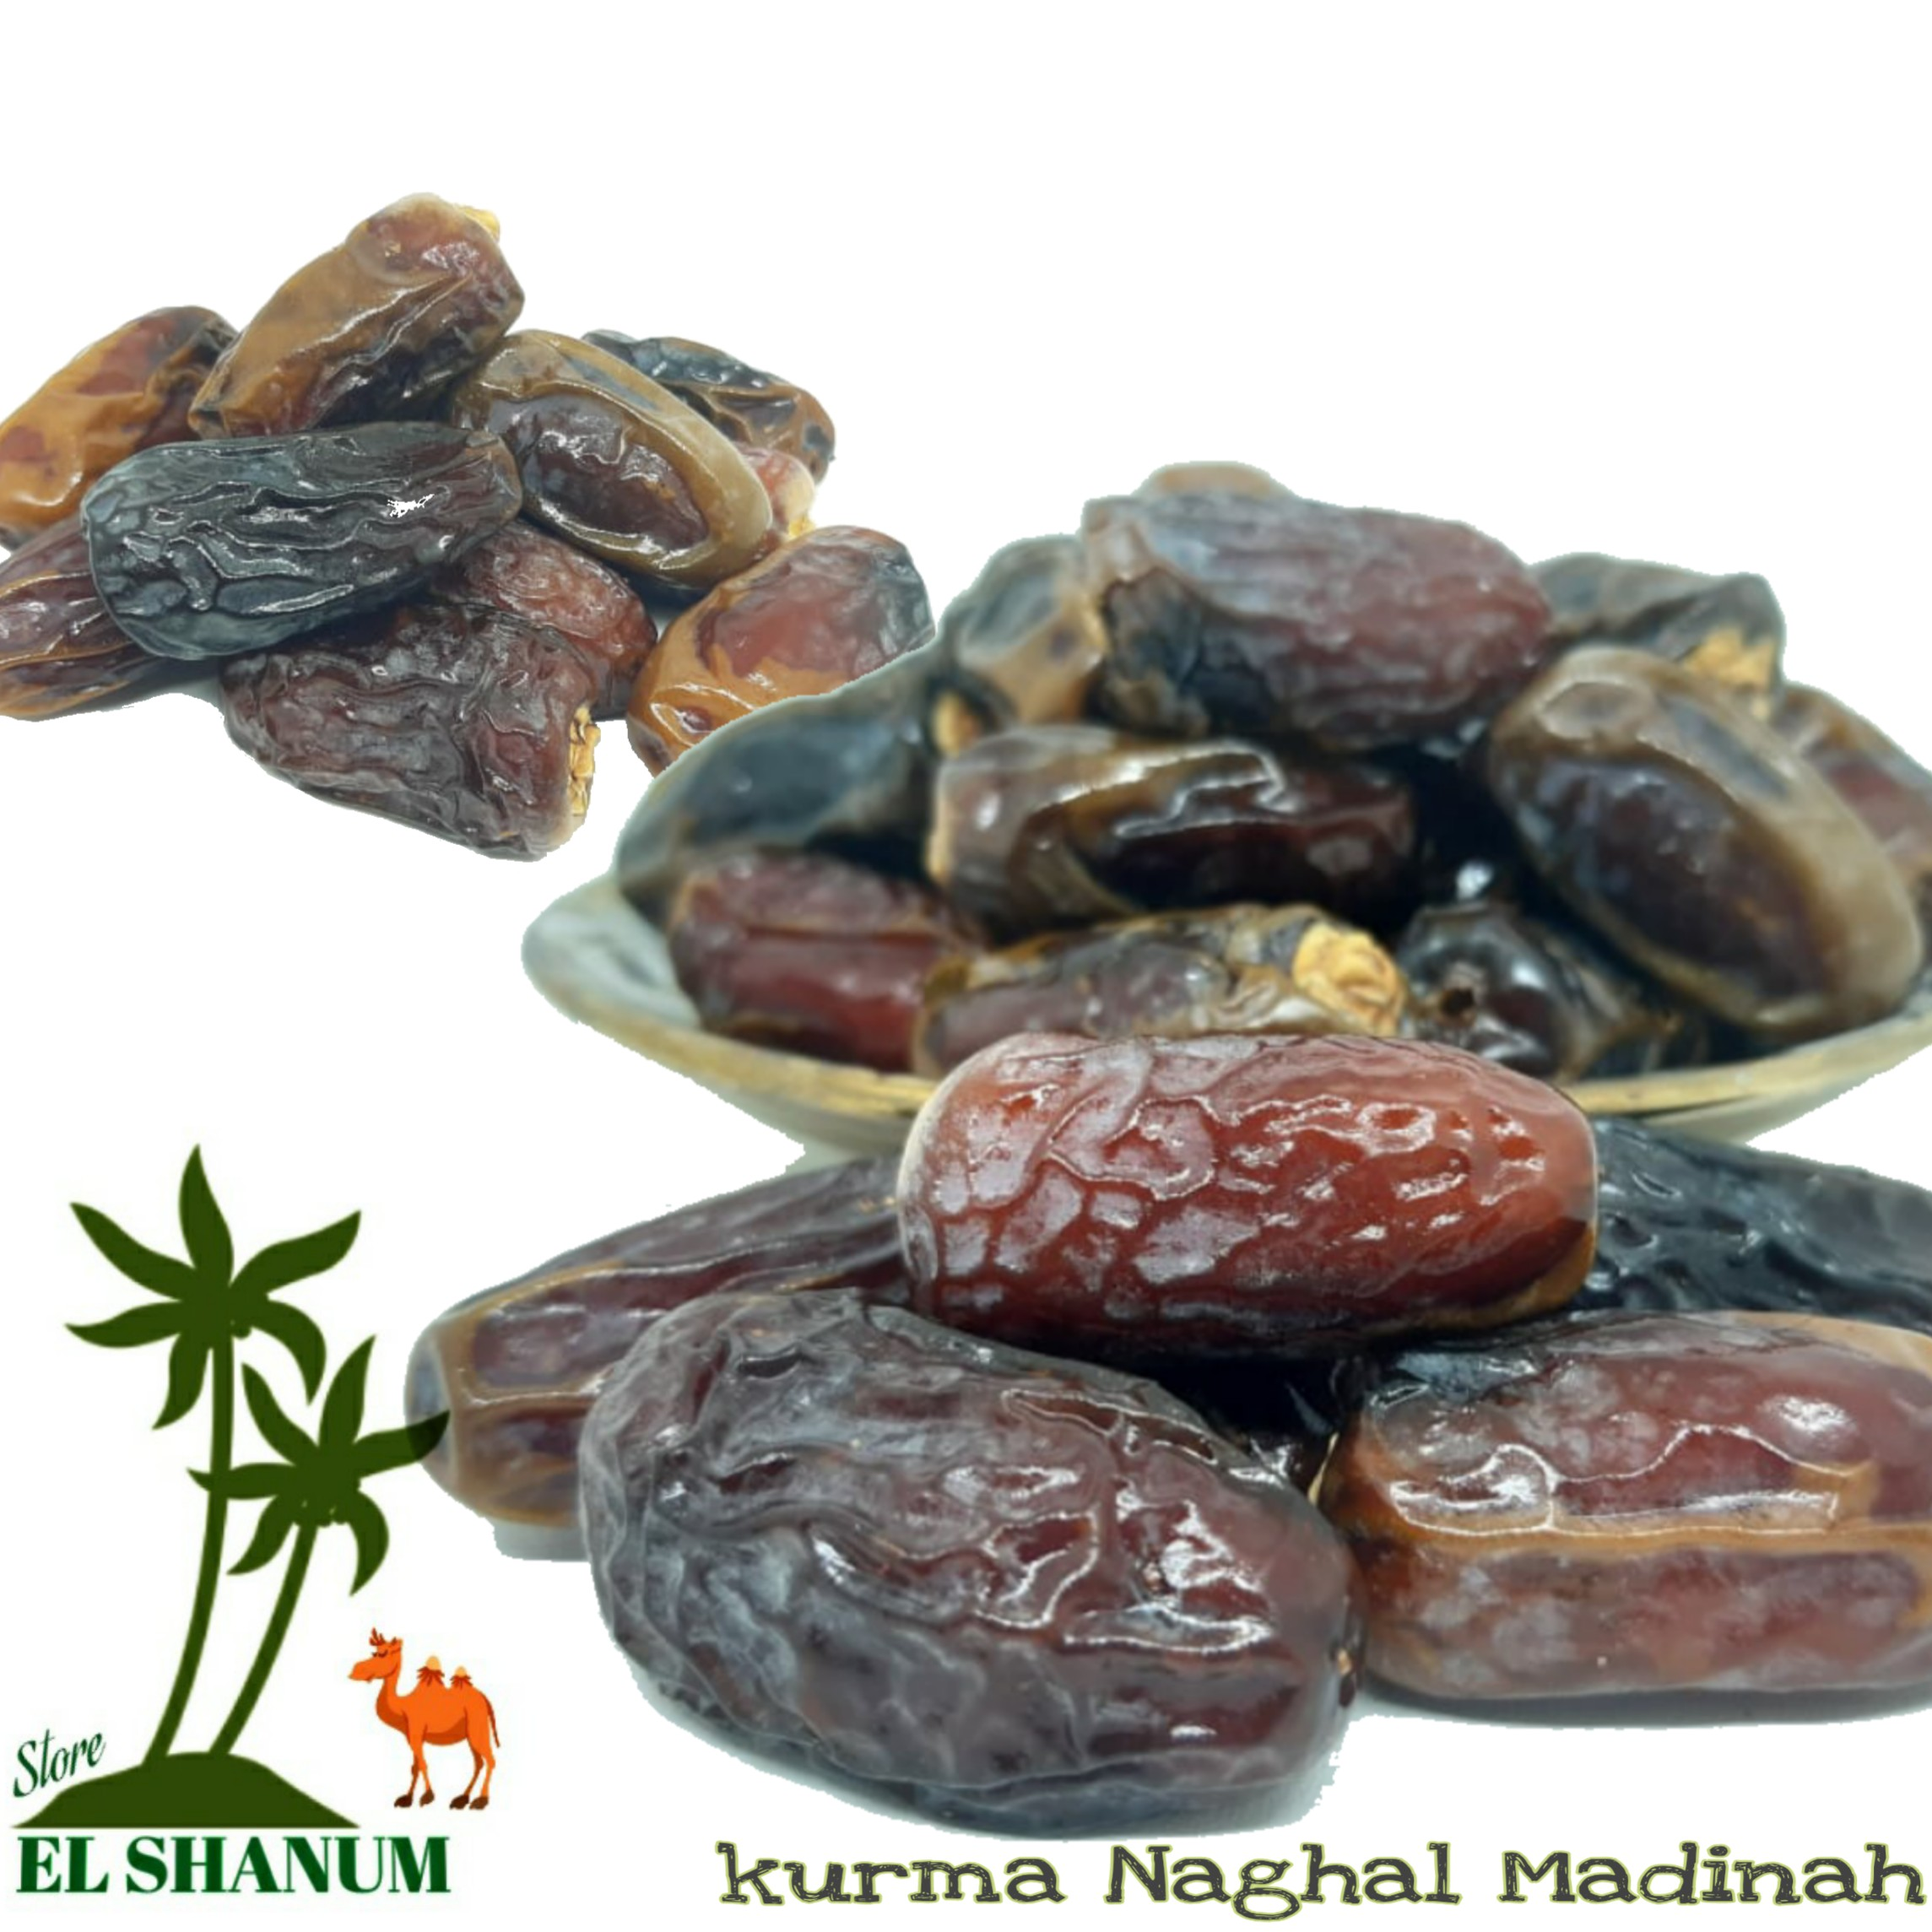 kurma medjool palestine 1kg /  gratis madu / medjool grade a / oleh oleh haji umroh